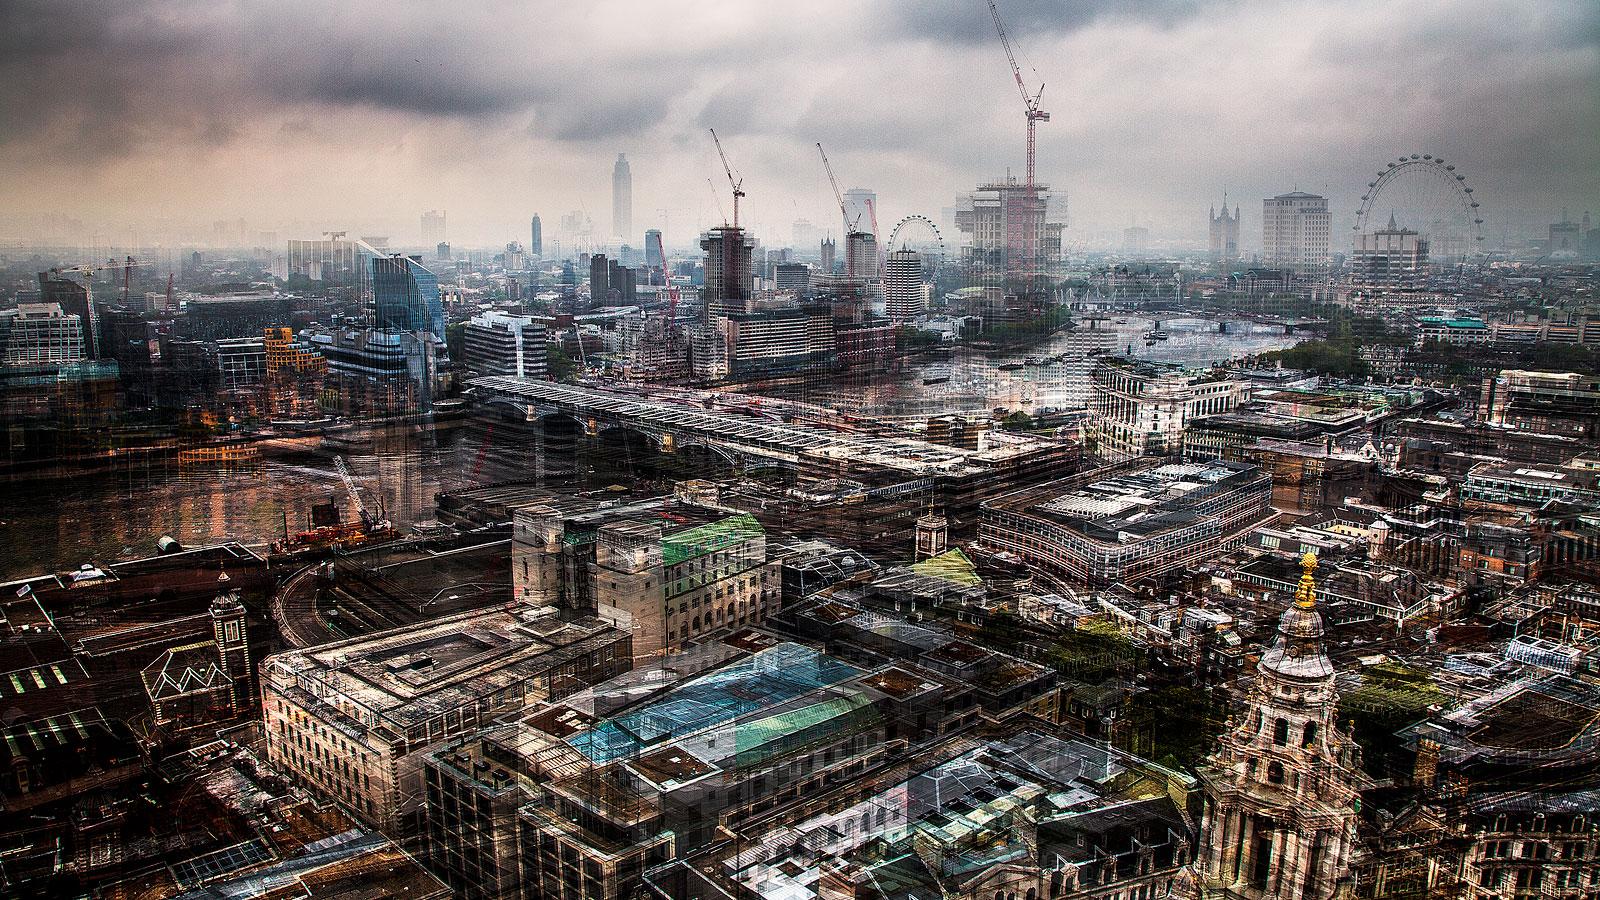 The nuances of London